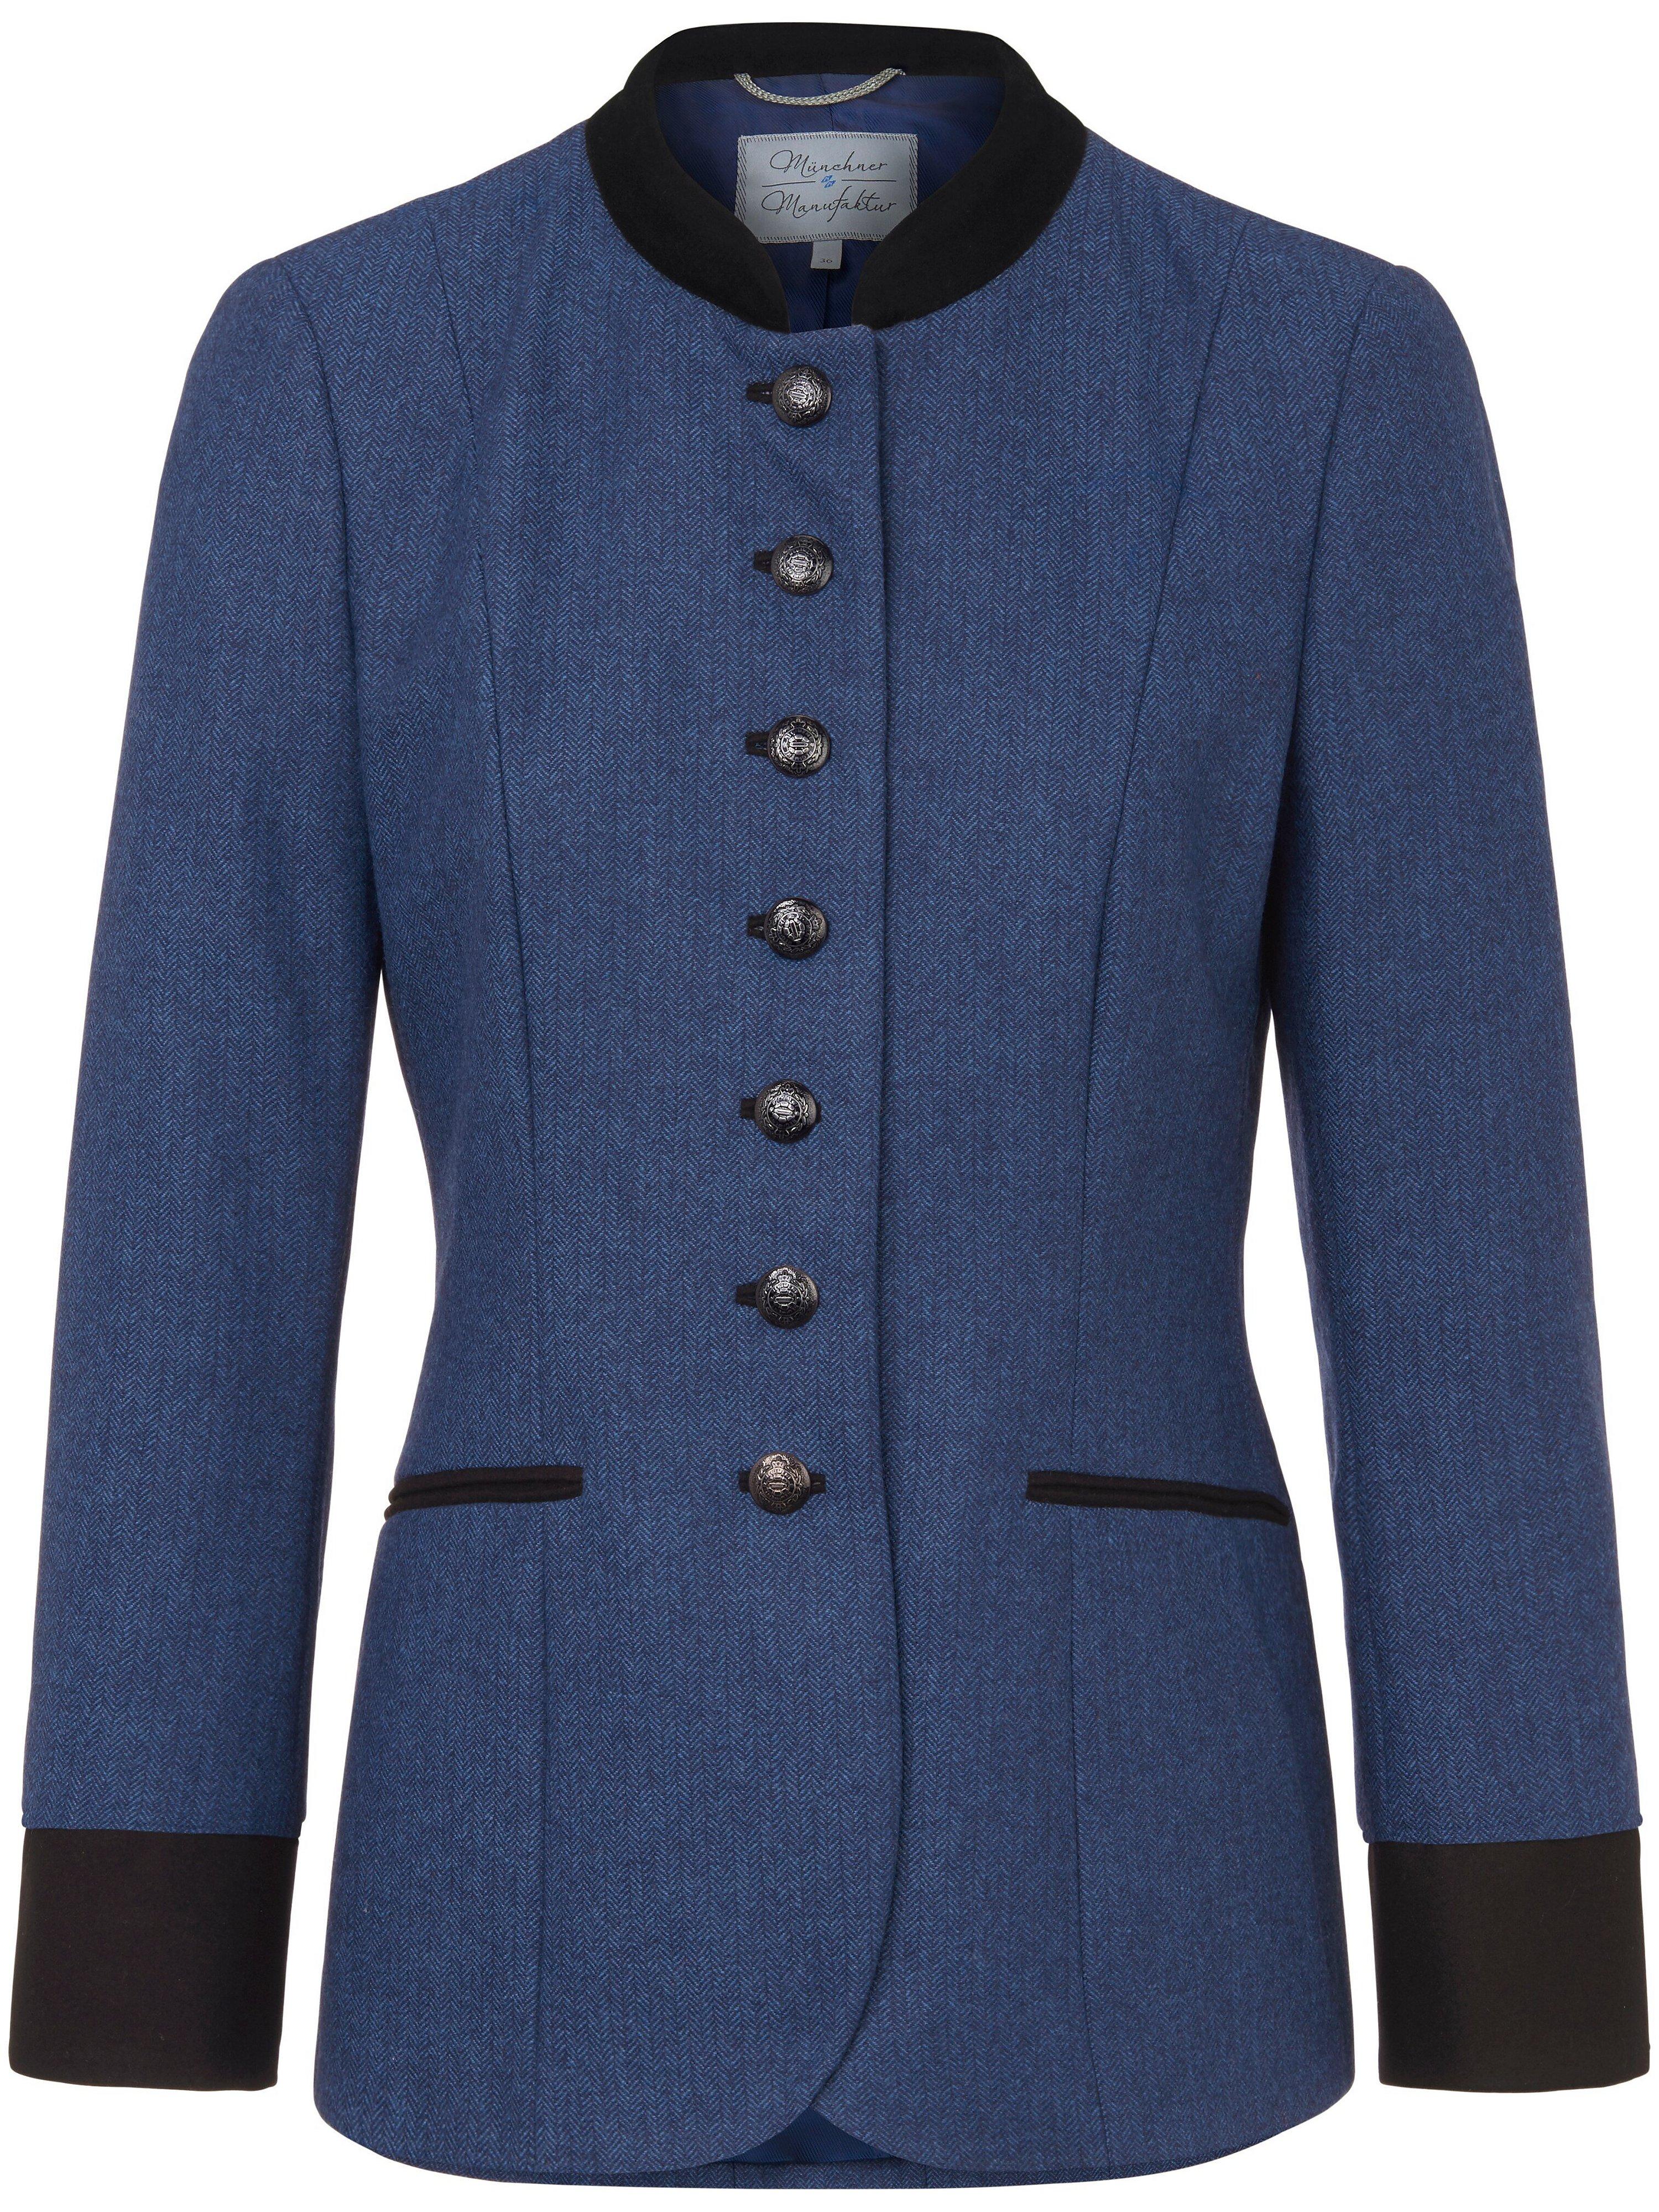 La veste 100% laine  Münchner Manufaktur bleu taille 50